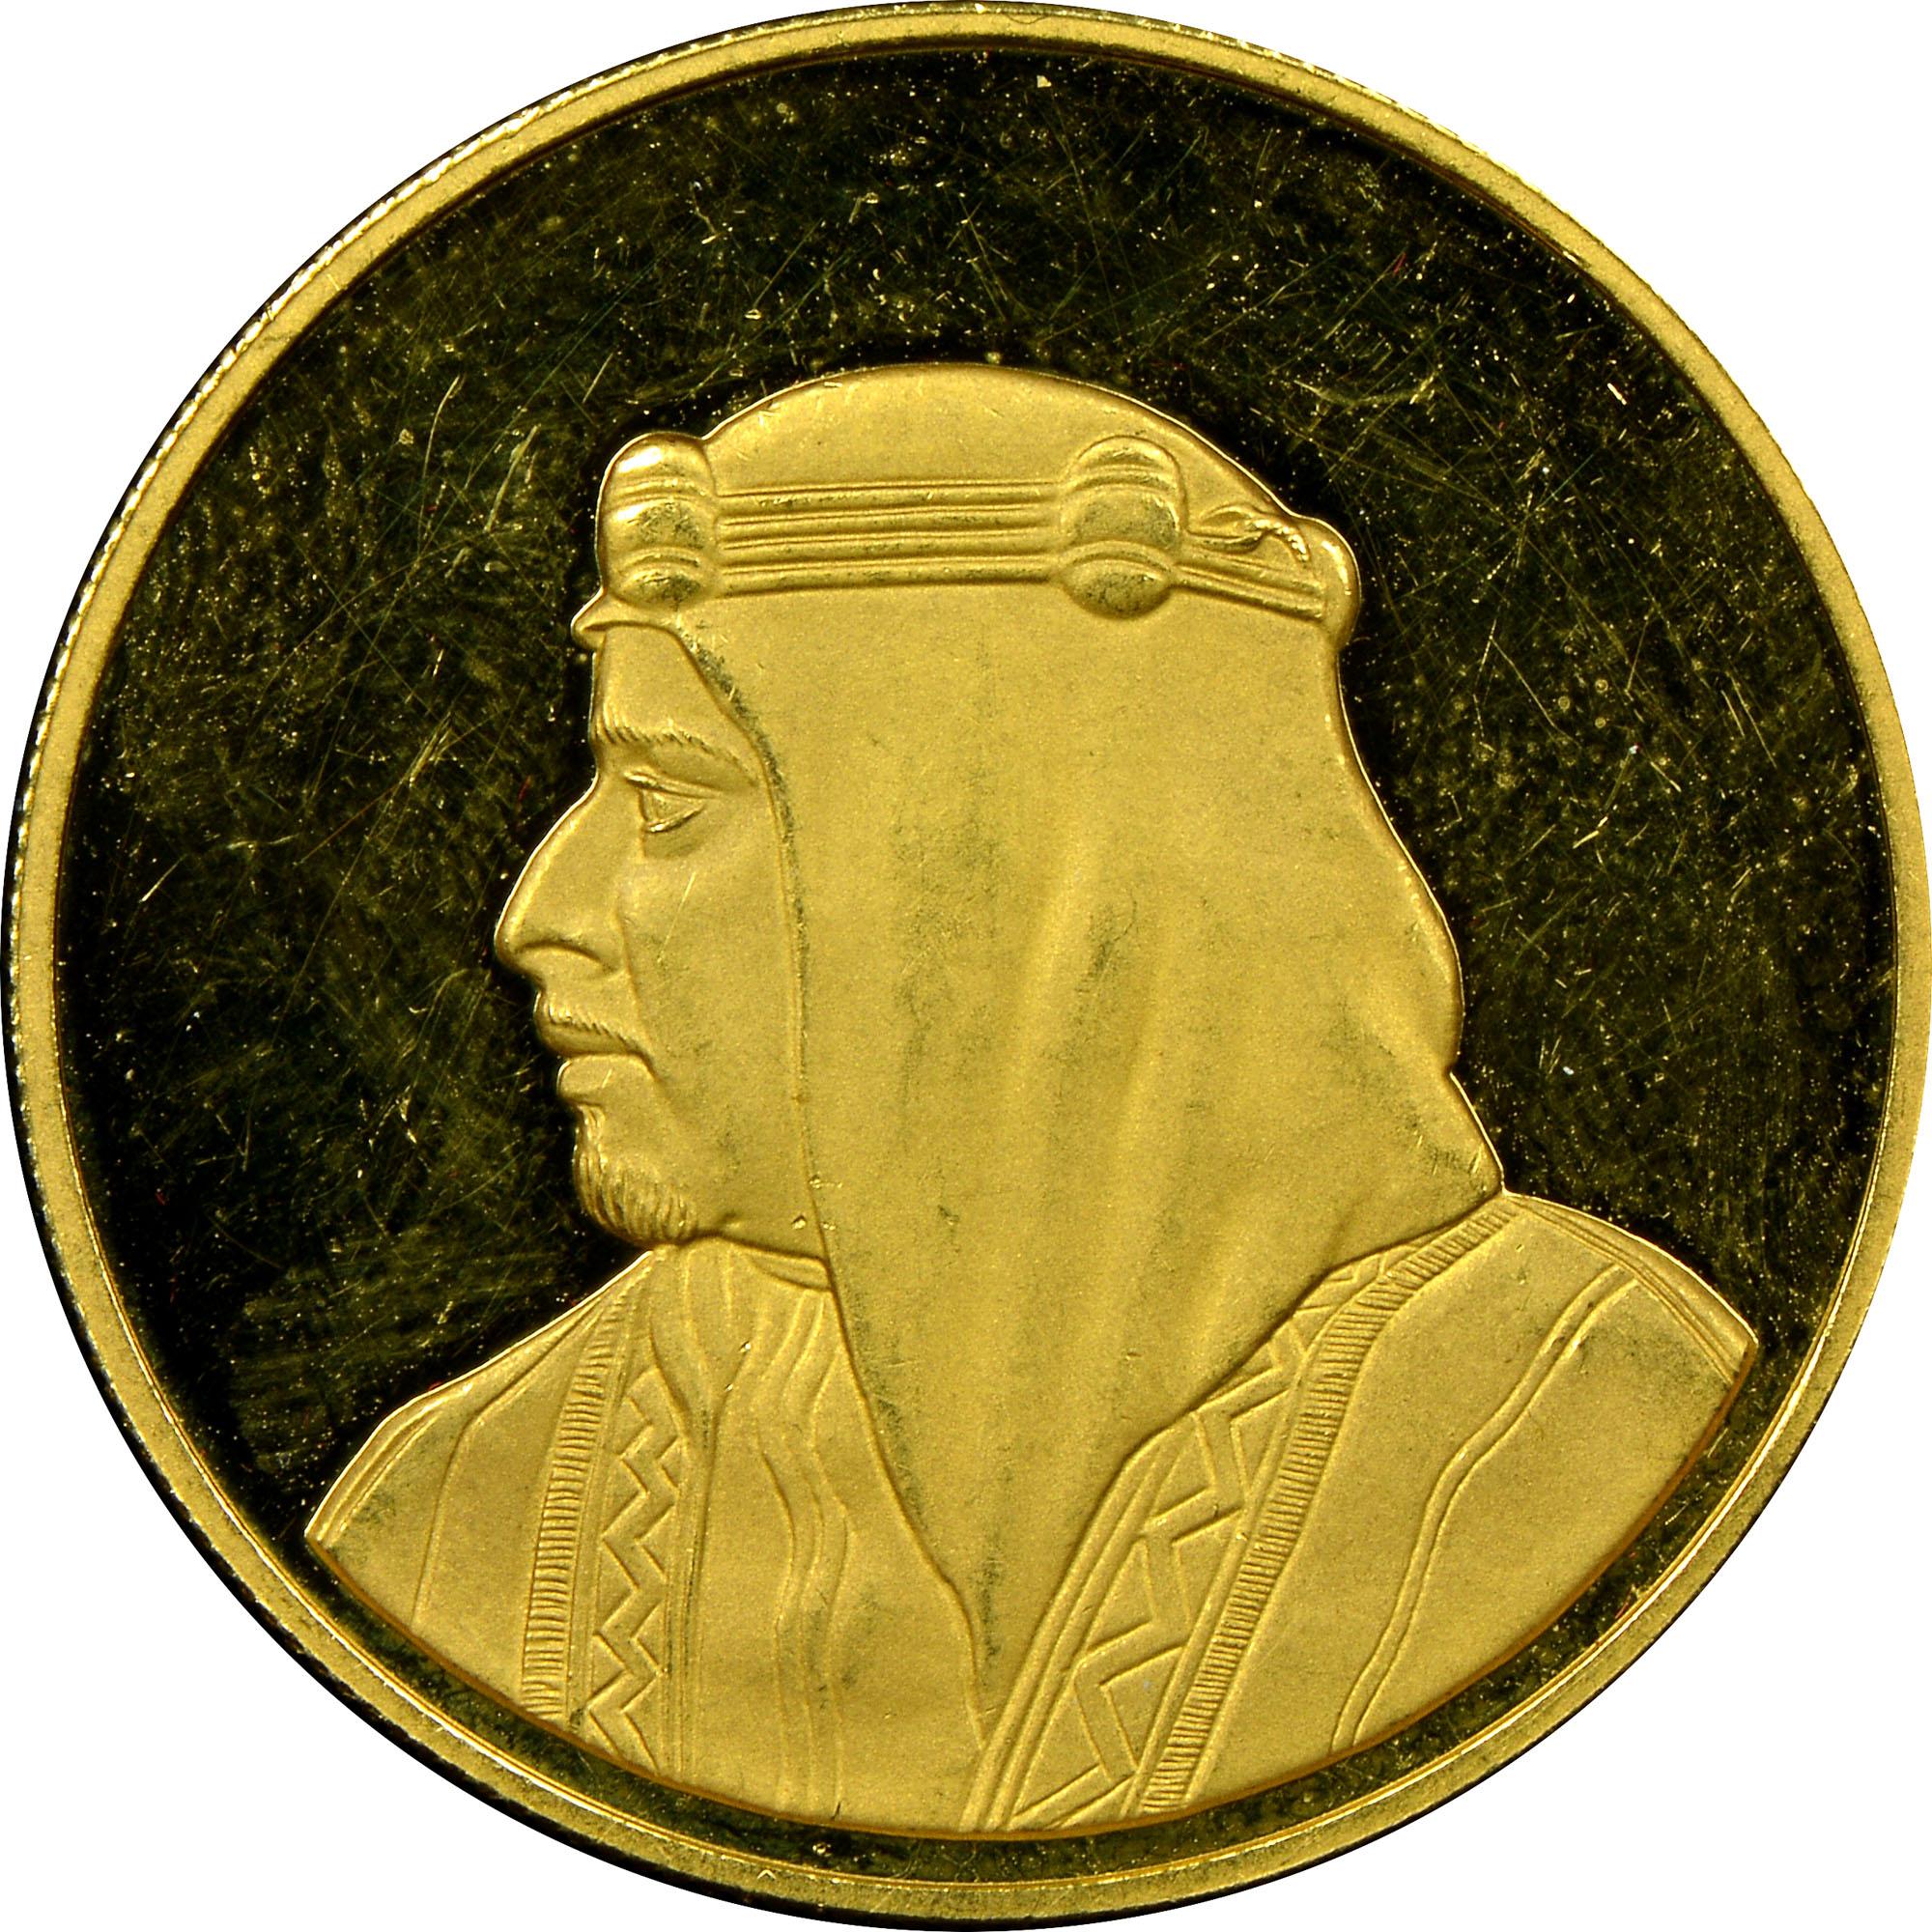 1404-1983 Bahrain 10 Dinars obverse